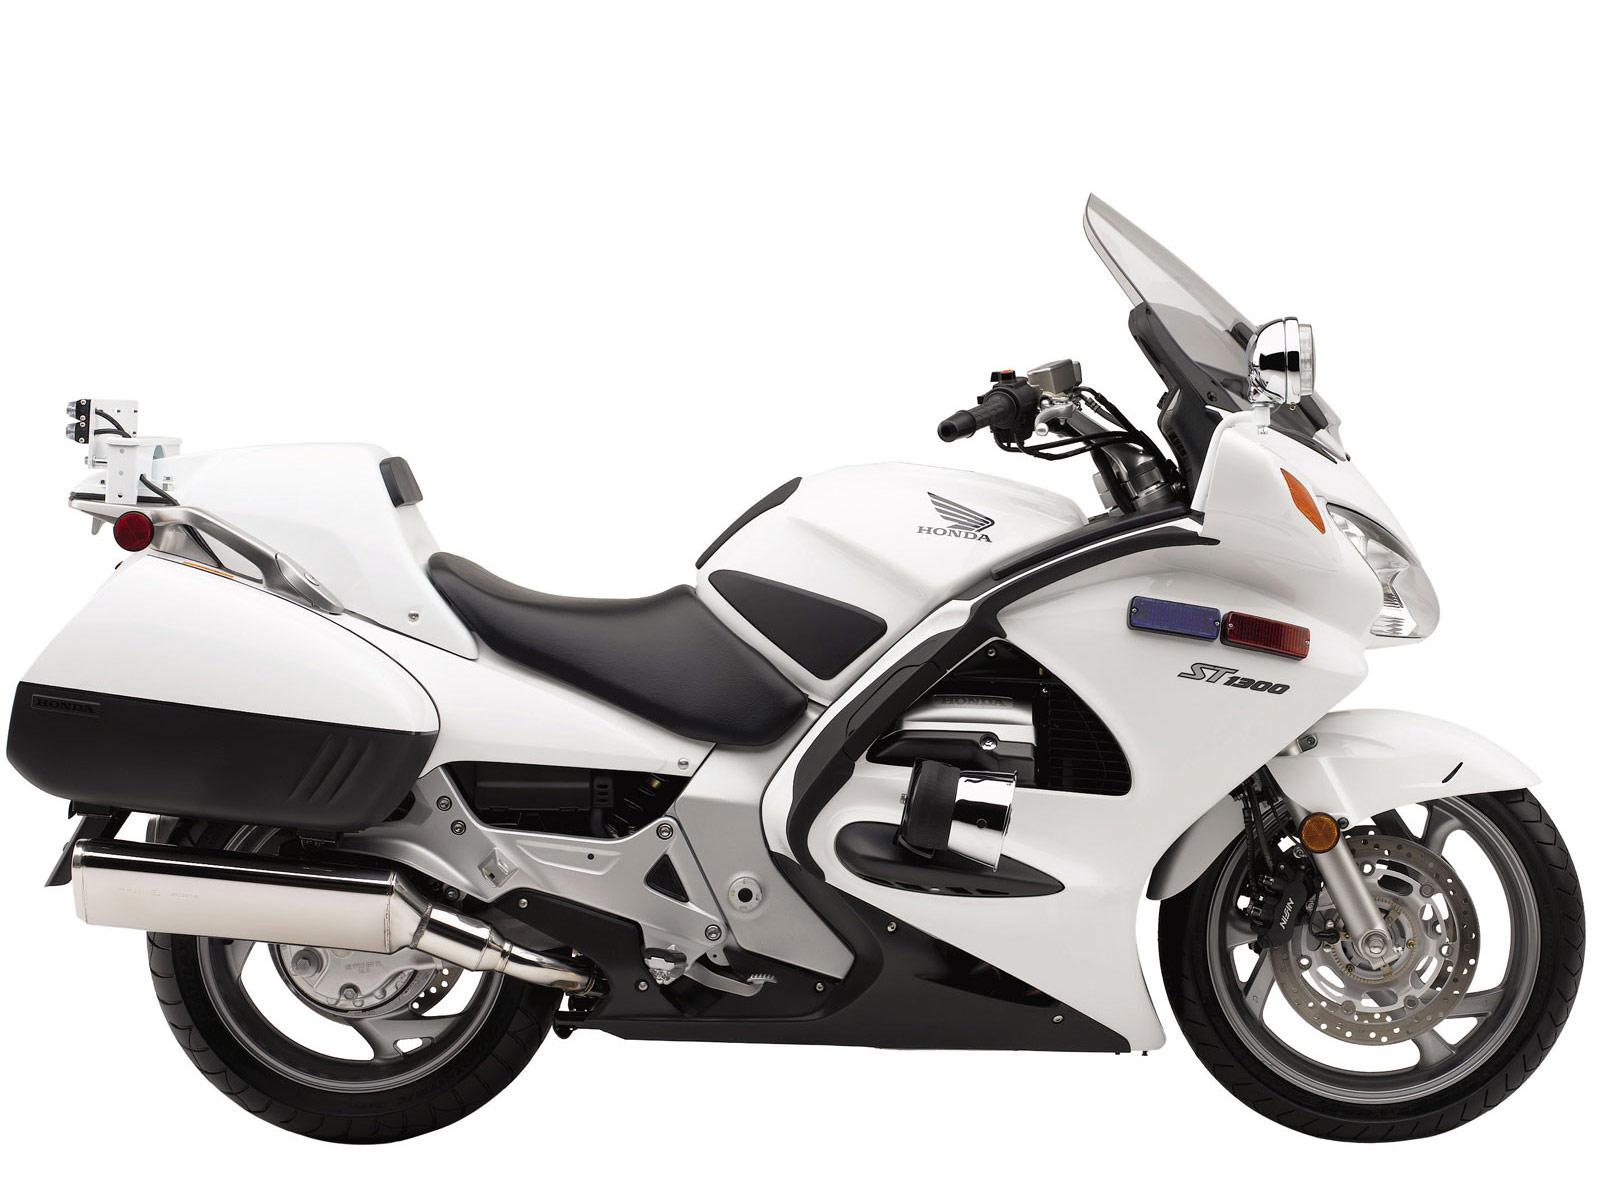 http://4.bp.blogspot.com/_ja0nvj5Jato/TKFCu_UZ4FI/AAAAAAAAINI/l0jyMv9Wca8/s1600/Honda_ST1300P_2011_motorcycle_pictures-2.jpg